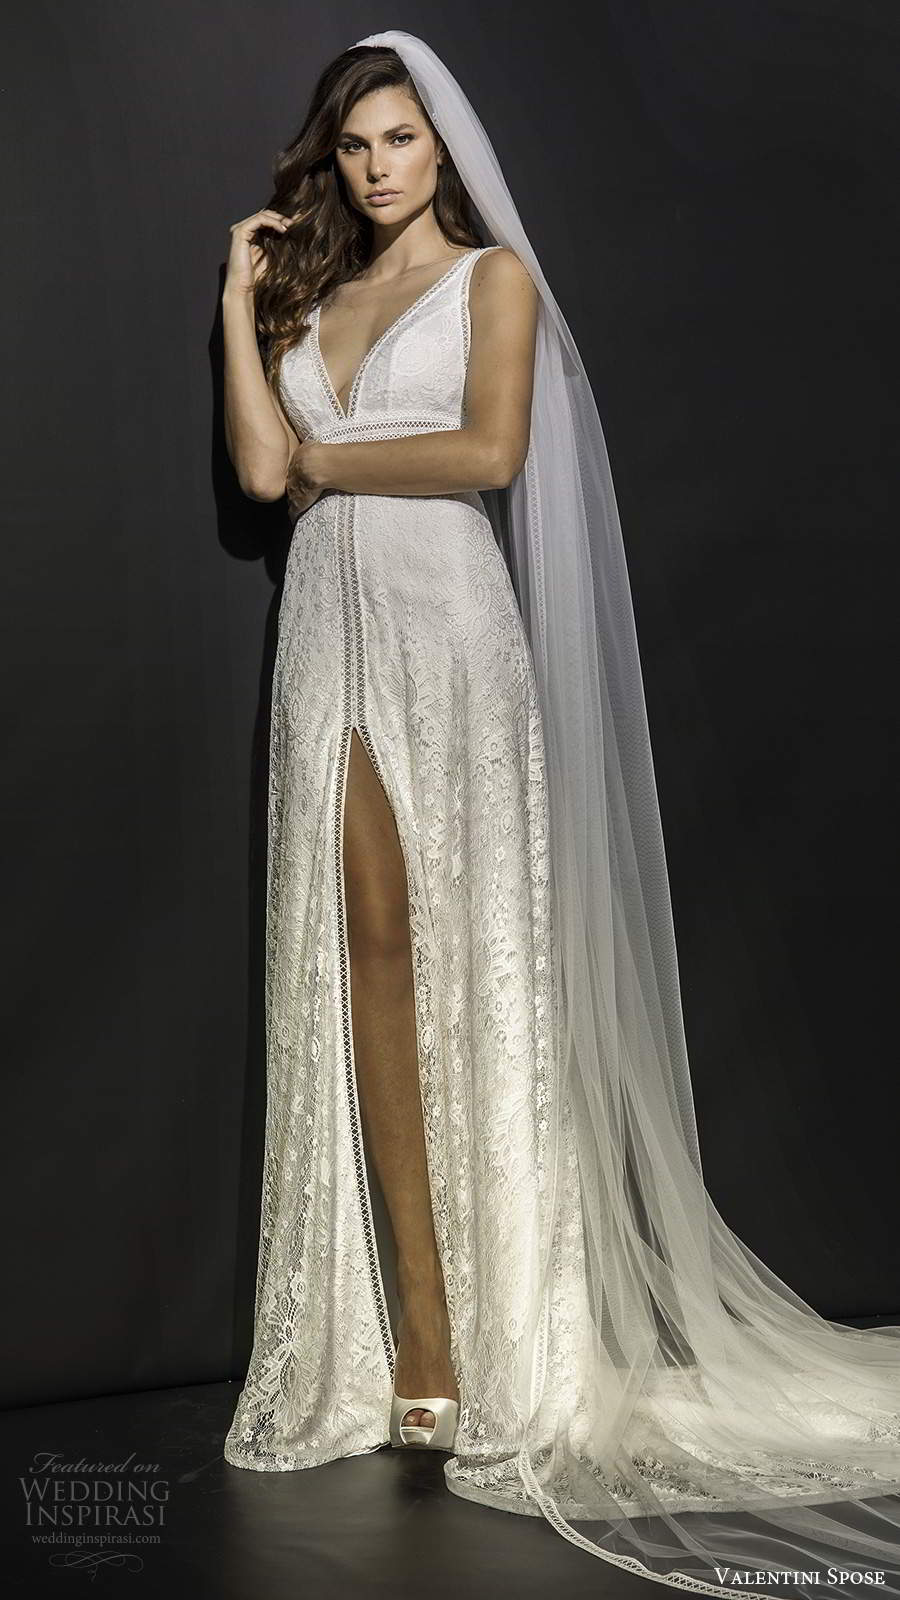 valentini spose fall 2020 bridal sleeveless plunging v neckline fully embellished lace column soft a line lace wedding dress slit skirt chapel train (8) mv